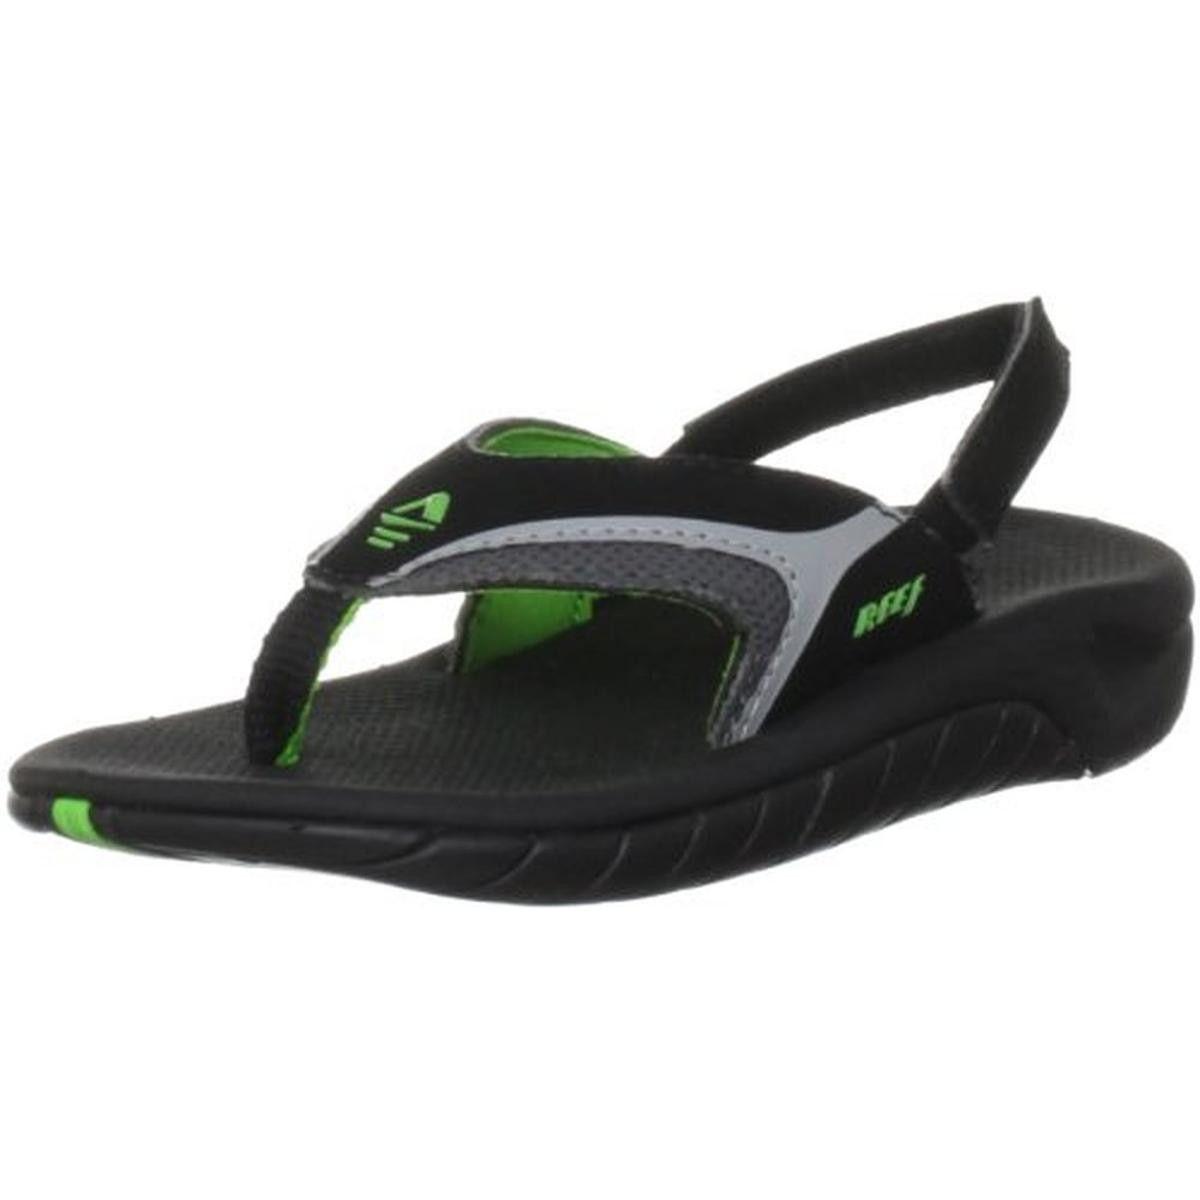 498136ac785b Reef Boys Slap II Slip On Toddler Thong Sandals